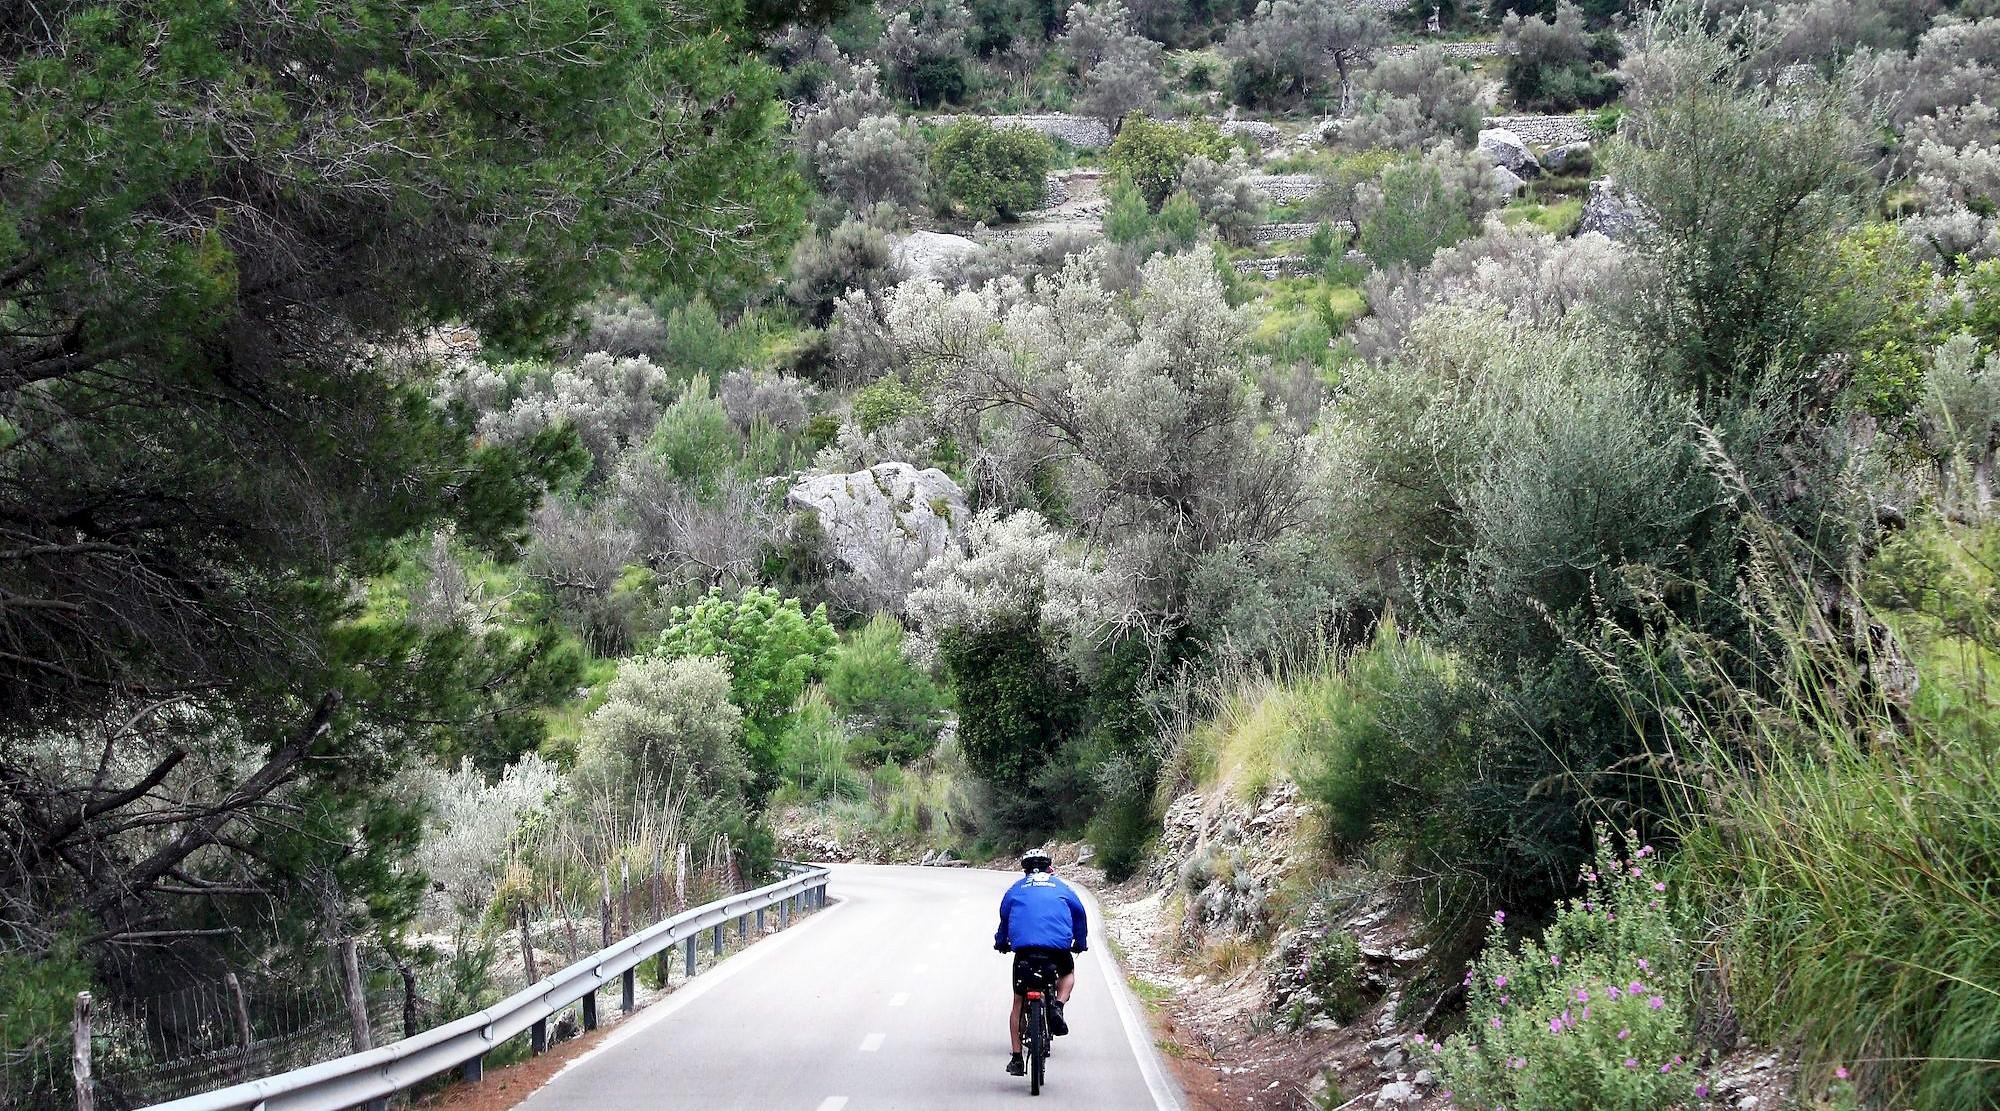 Serra de Tramuntana en bicicleta. Alaro. BICIS EN RUTA. 1170x650